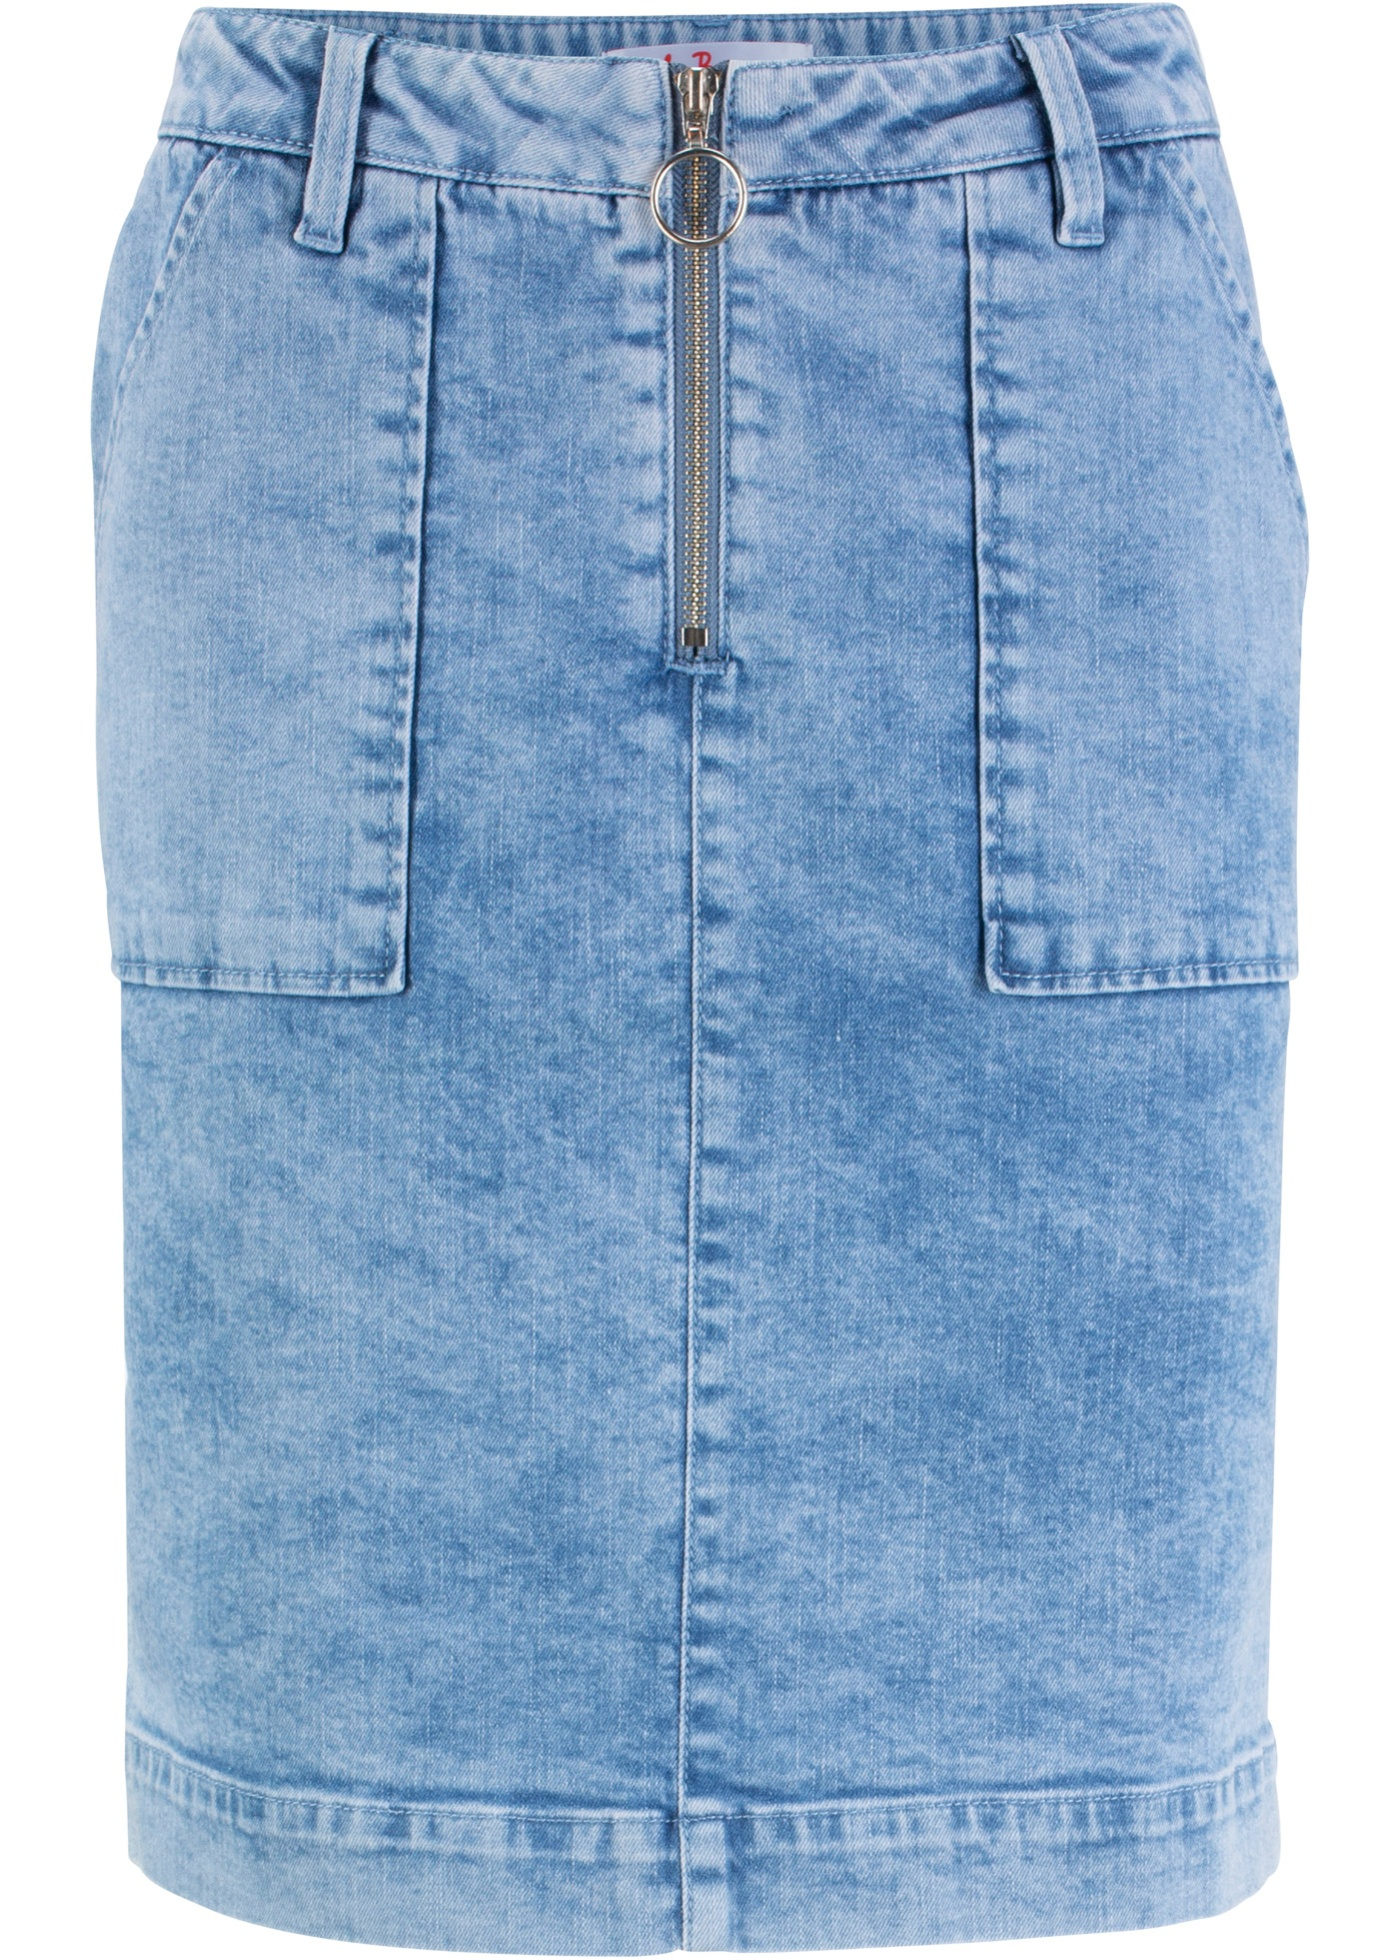 Baner Bleu John Extensible Jeanswear Jean En Femme BonprixJupe Pour TZXiuOkP